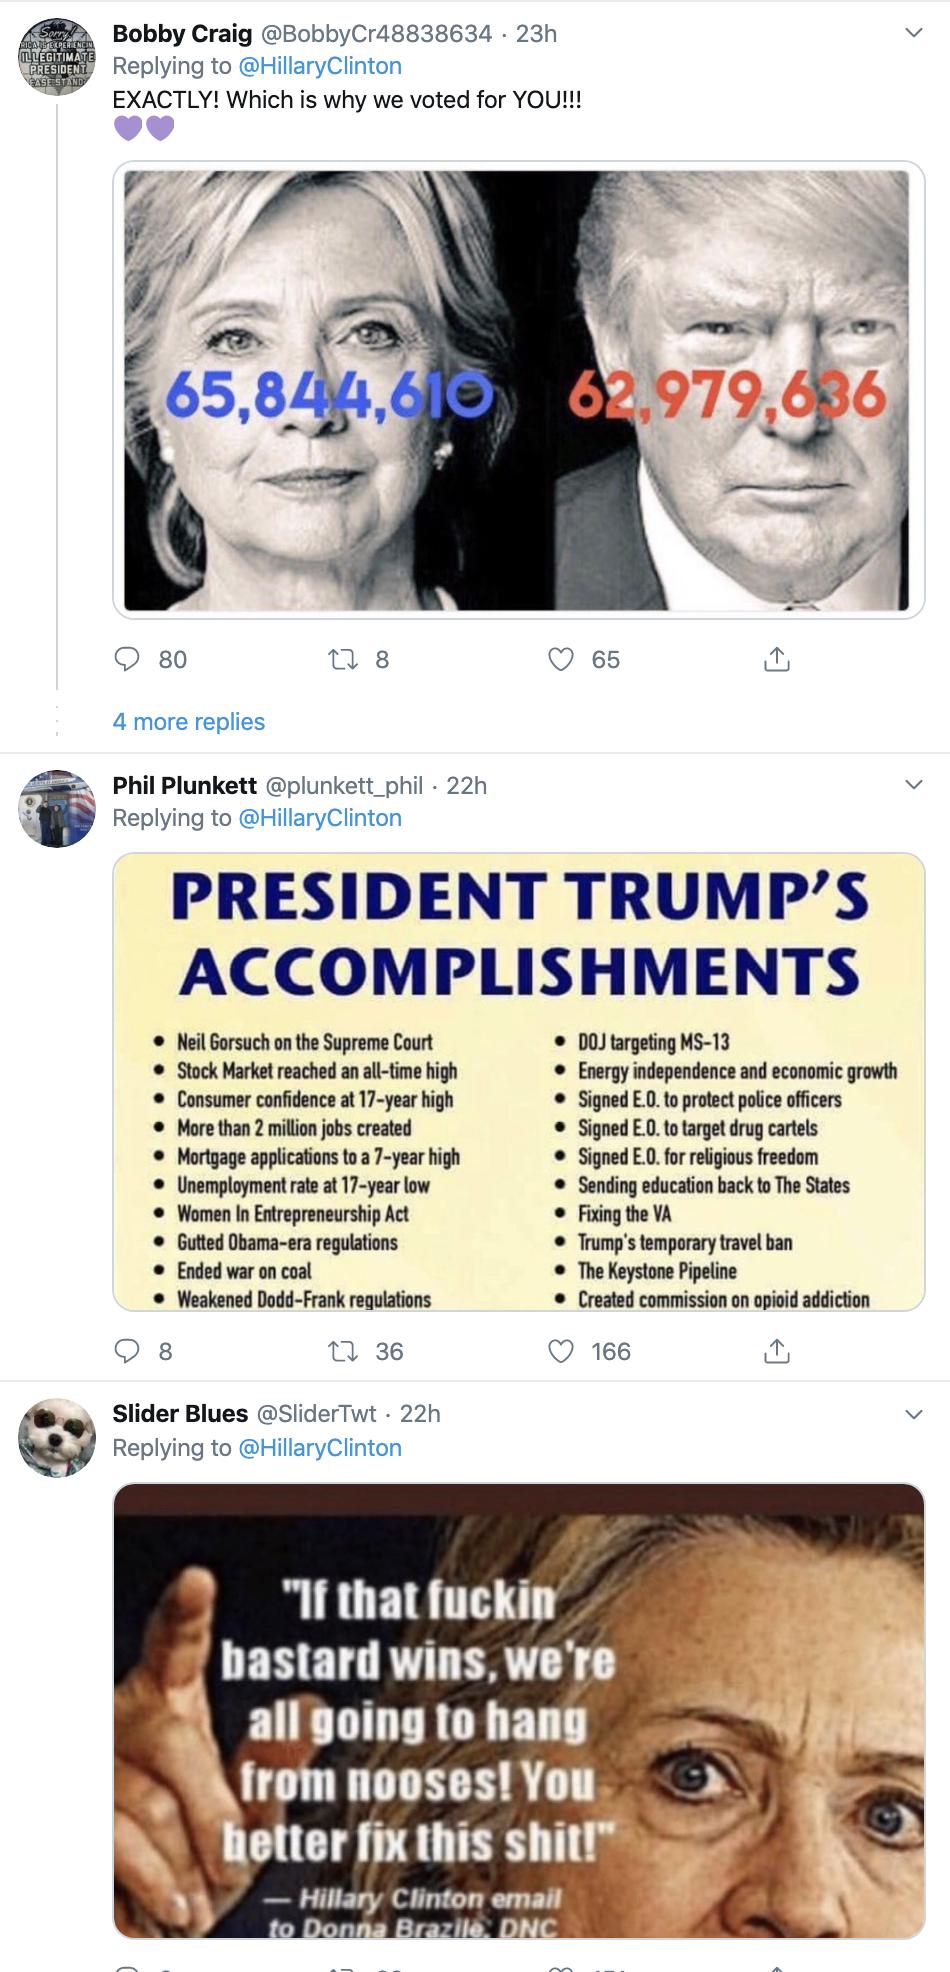 Screen-Shot-2019-12-11-at-9.13.49-AM Clinton Embarrasses Trump With Impeachment Tweet Trolling Featured Hillary Clinton Impeachment Politics